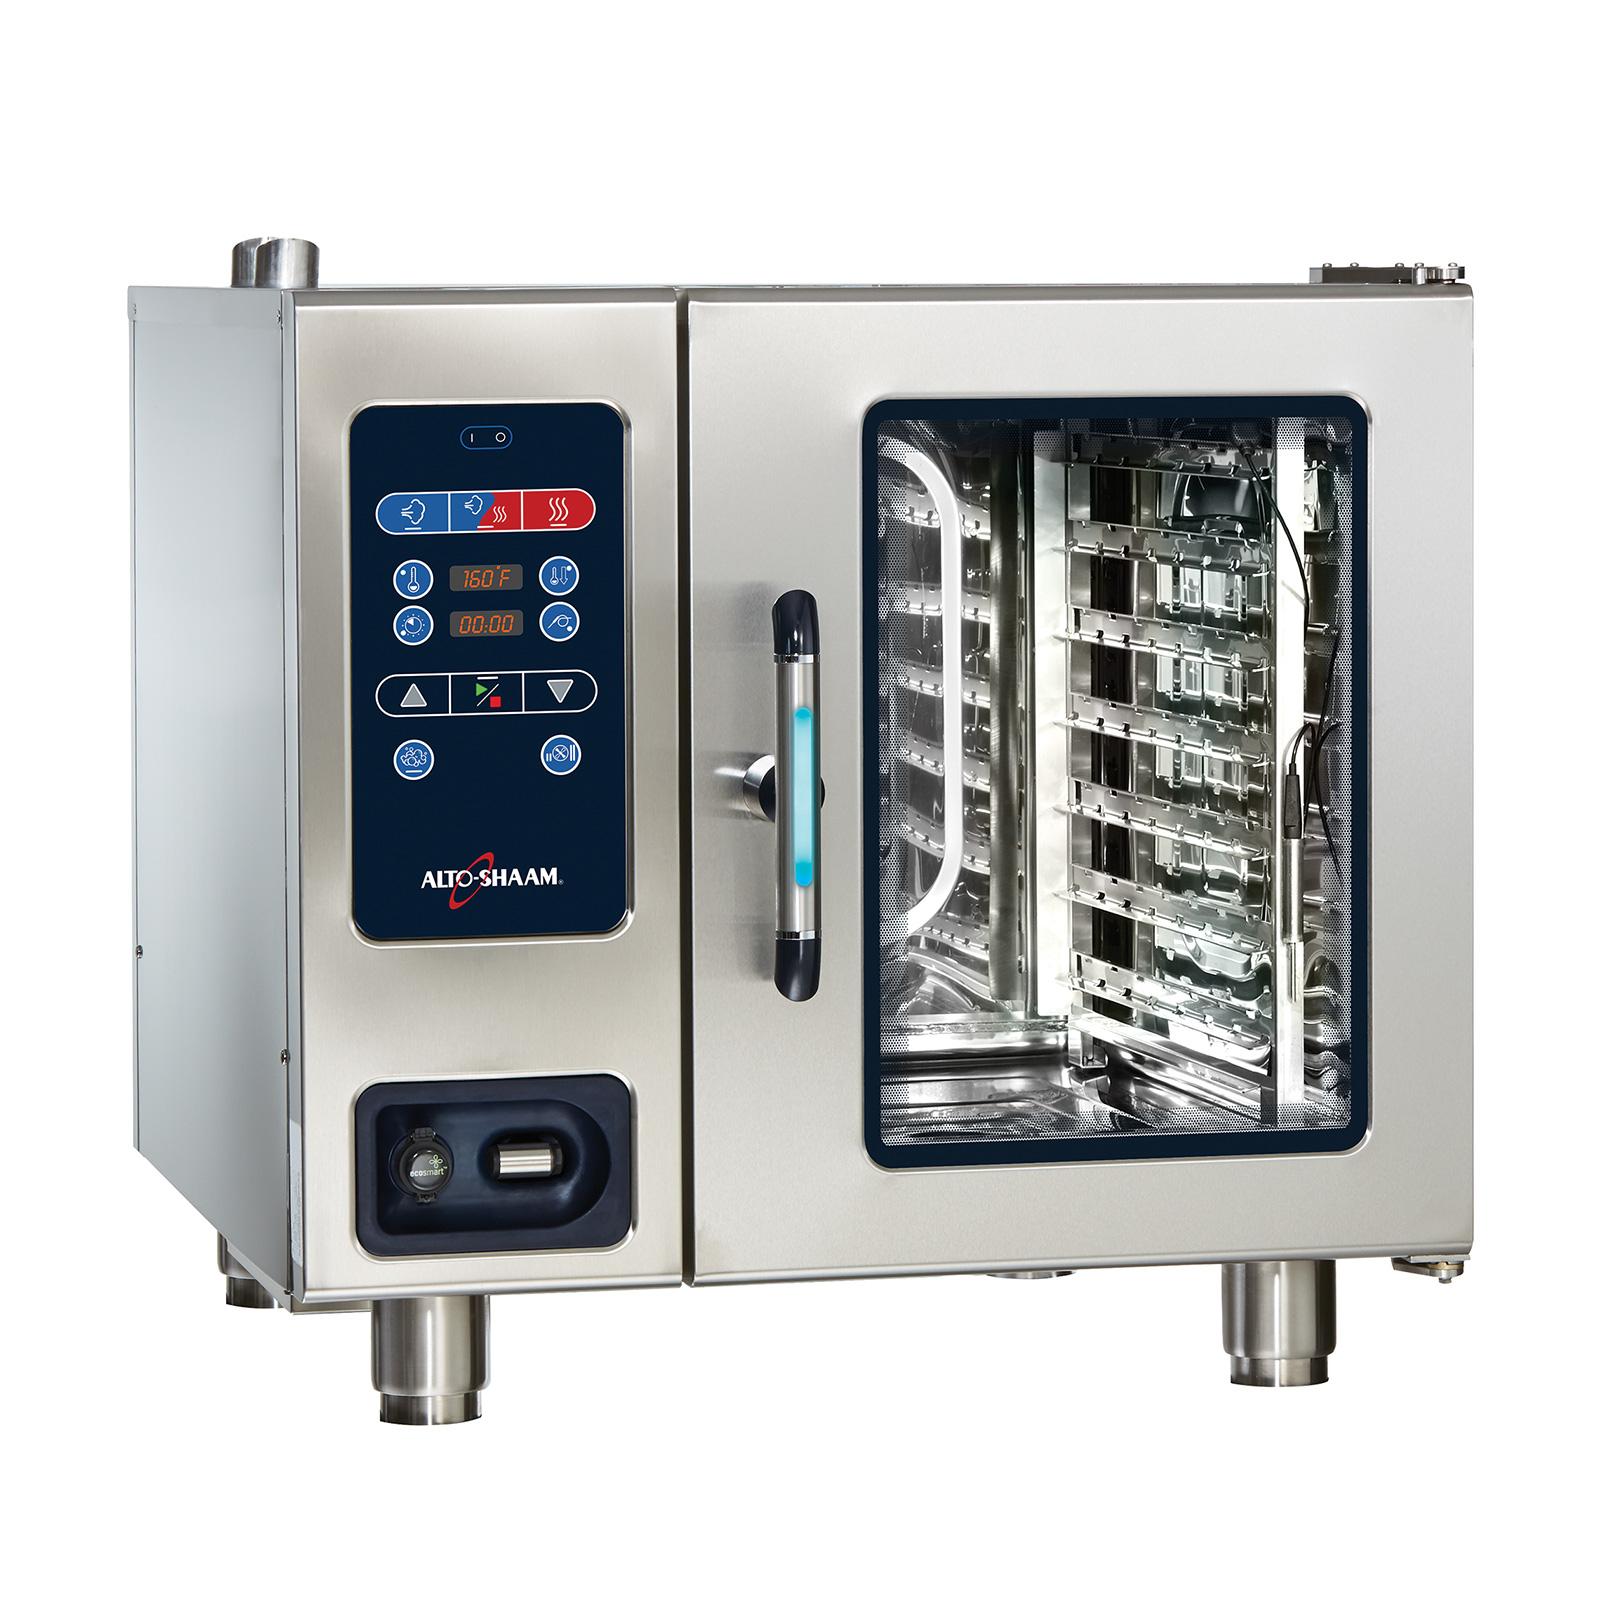 Alto-Shaam CTC6-10E combi oven, electric